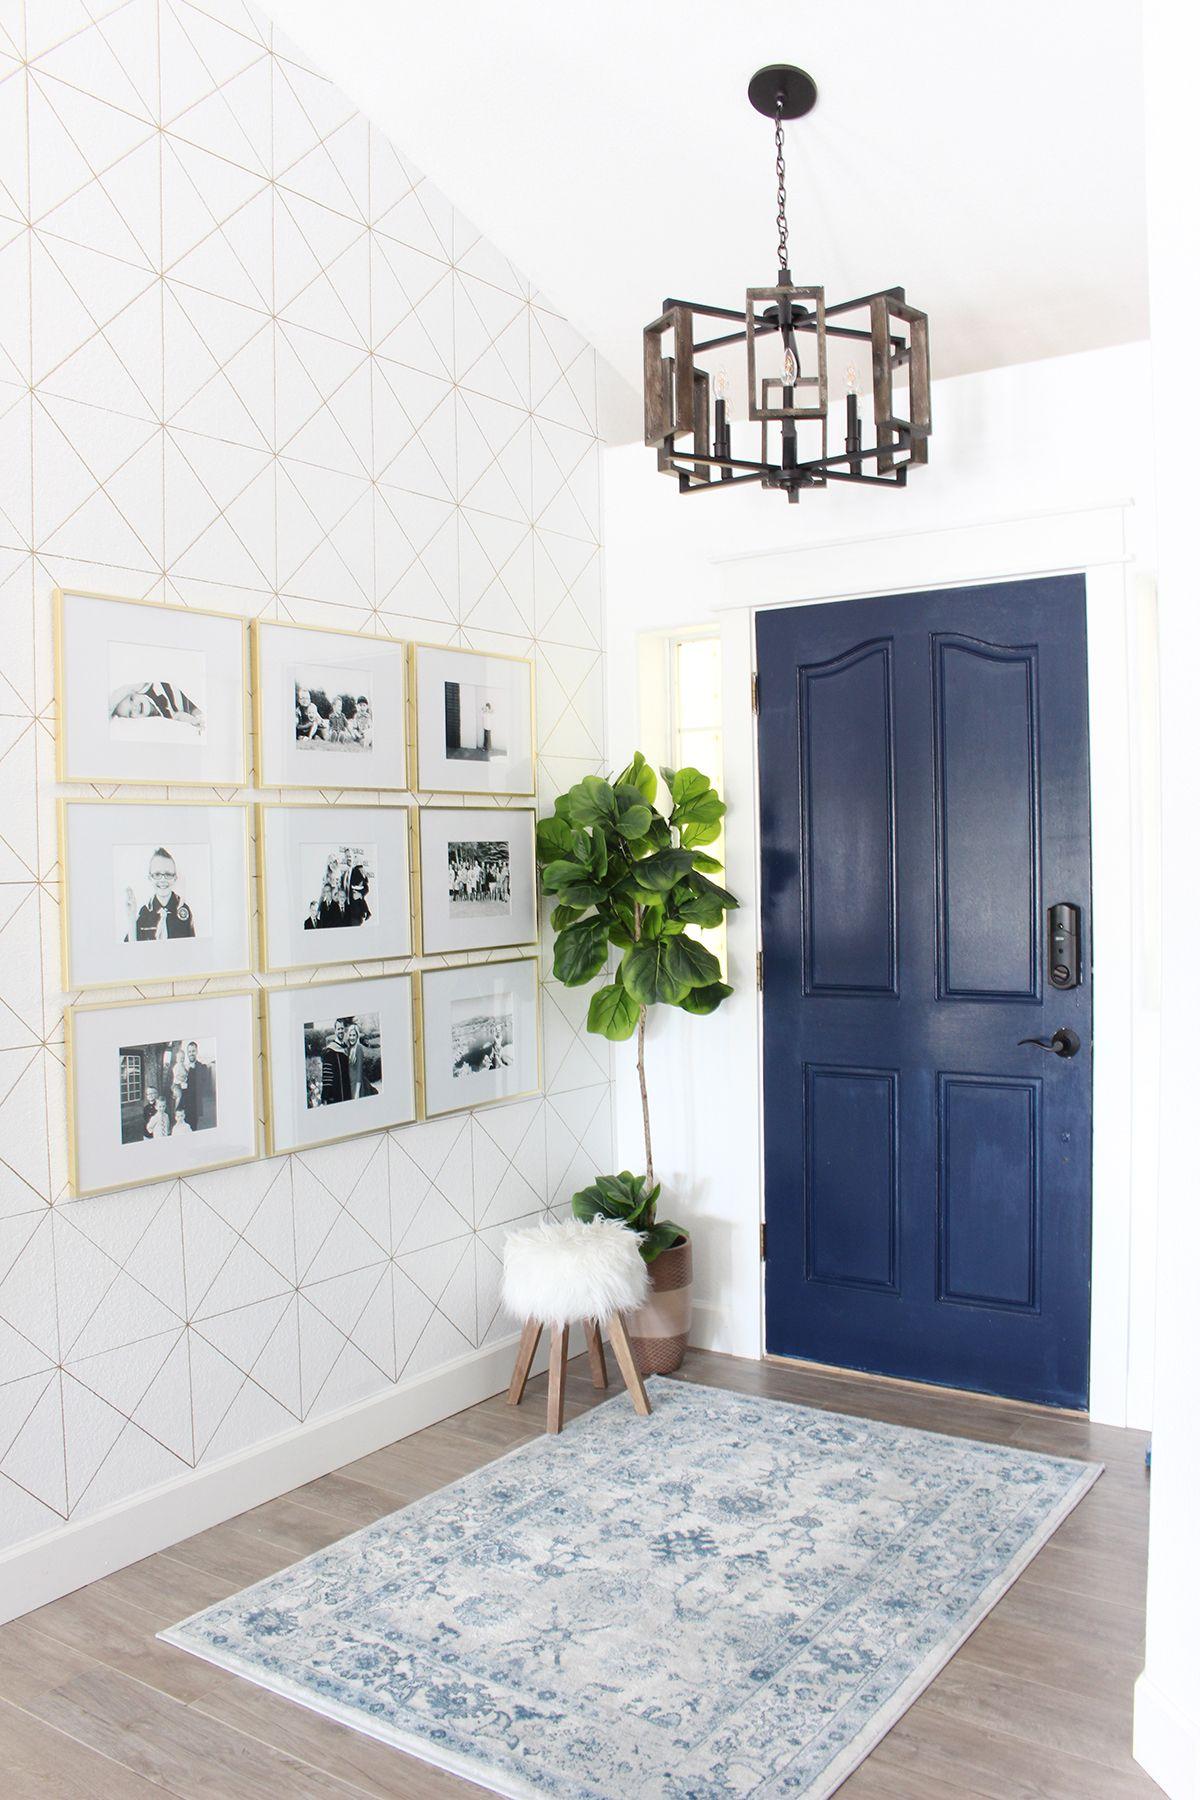 Park Home Reno: Entry Way Makeover | foyer ideas | Pinterest ...